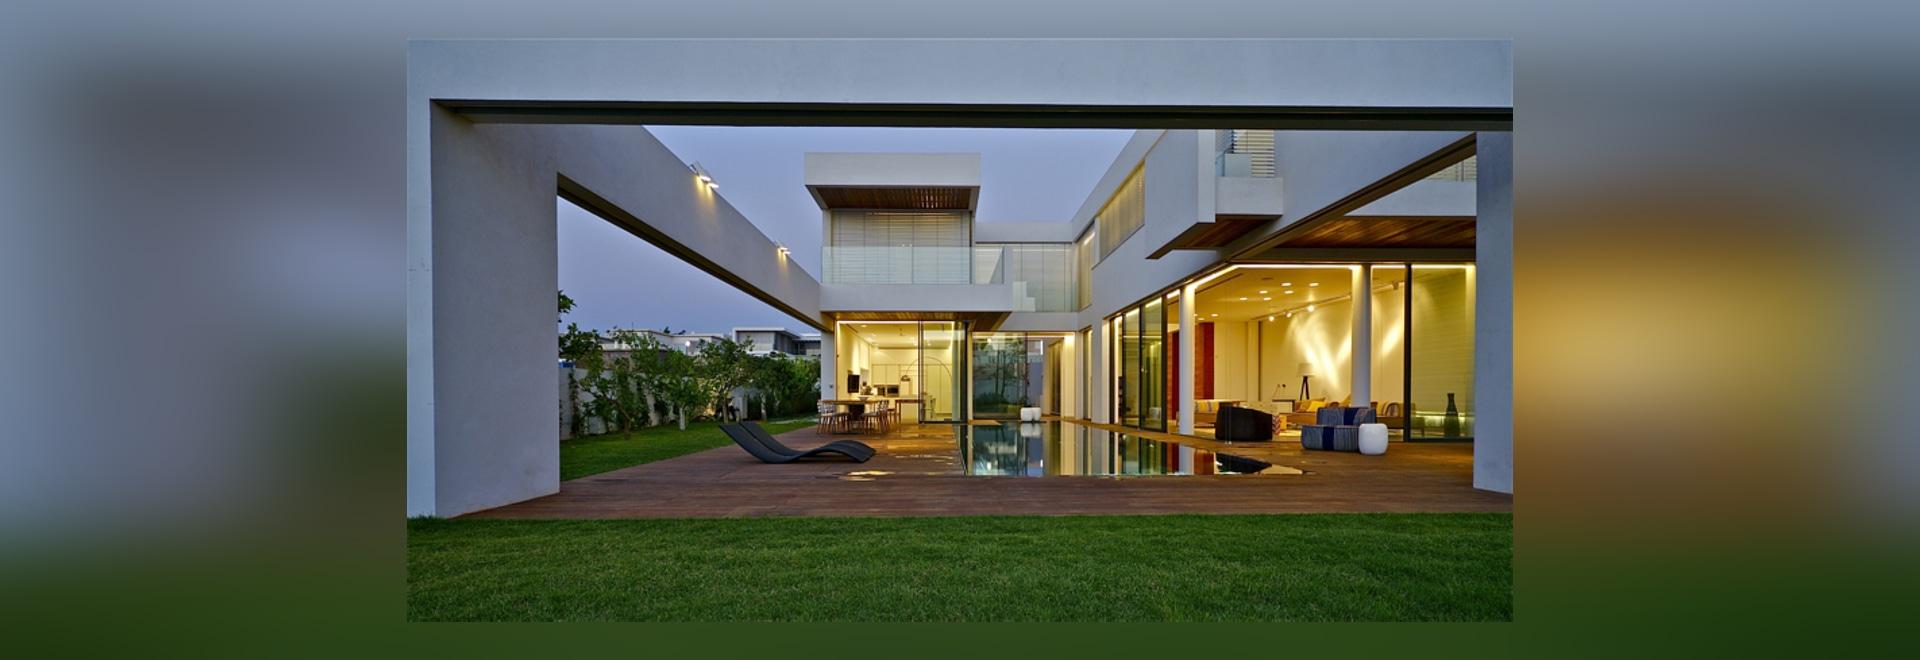 Gallone marom Architekten entwirft minimalistic Rückzug in Israel ...